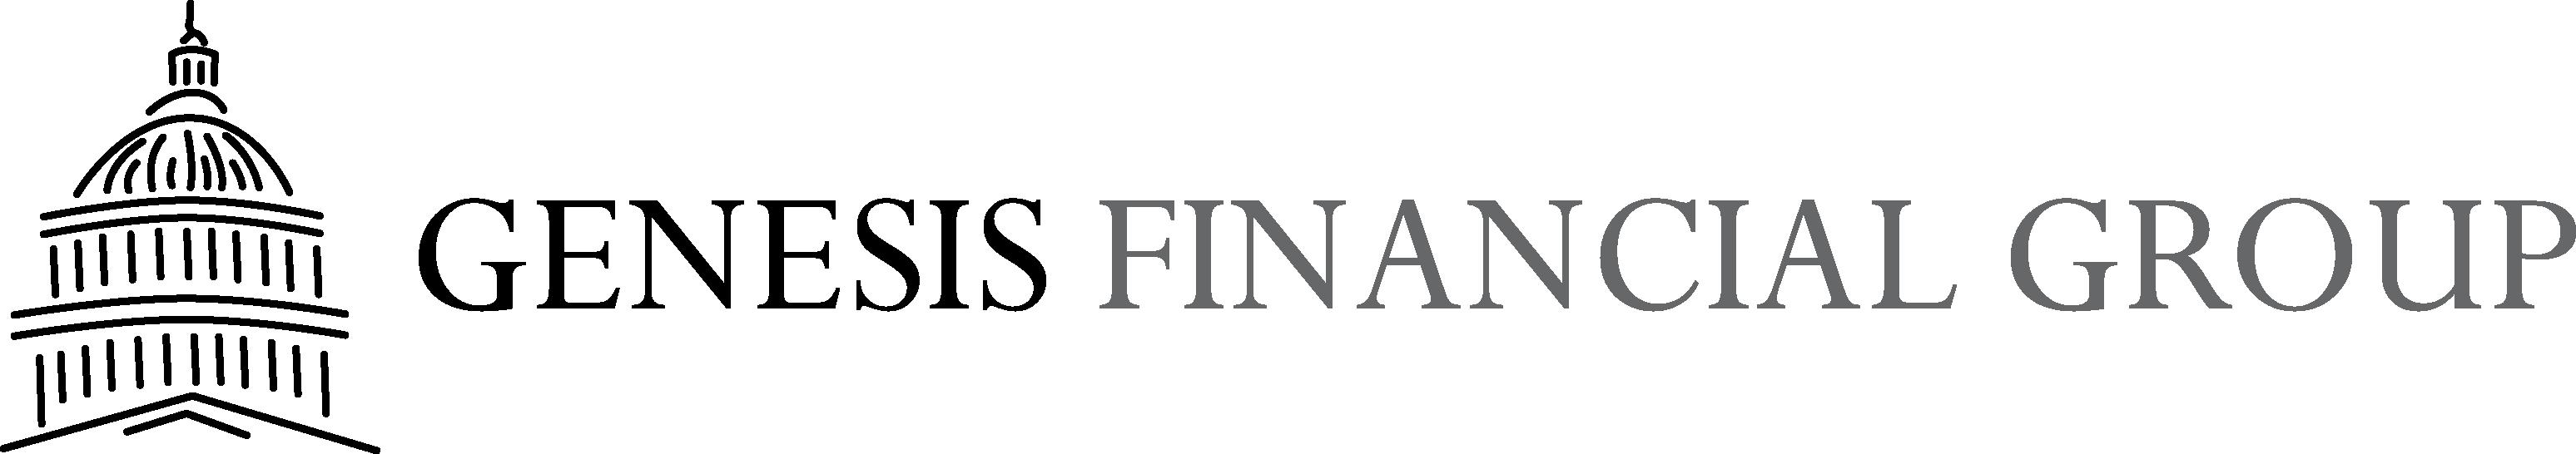 Genesis Financial